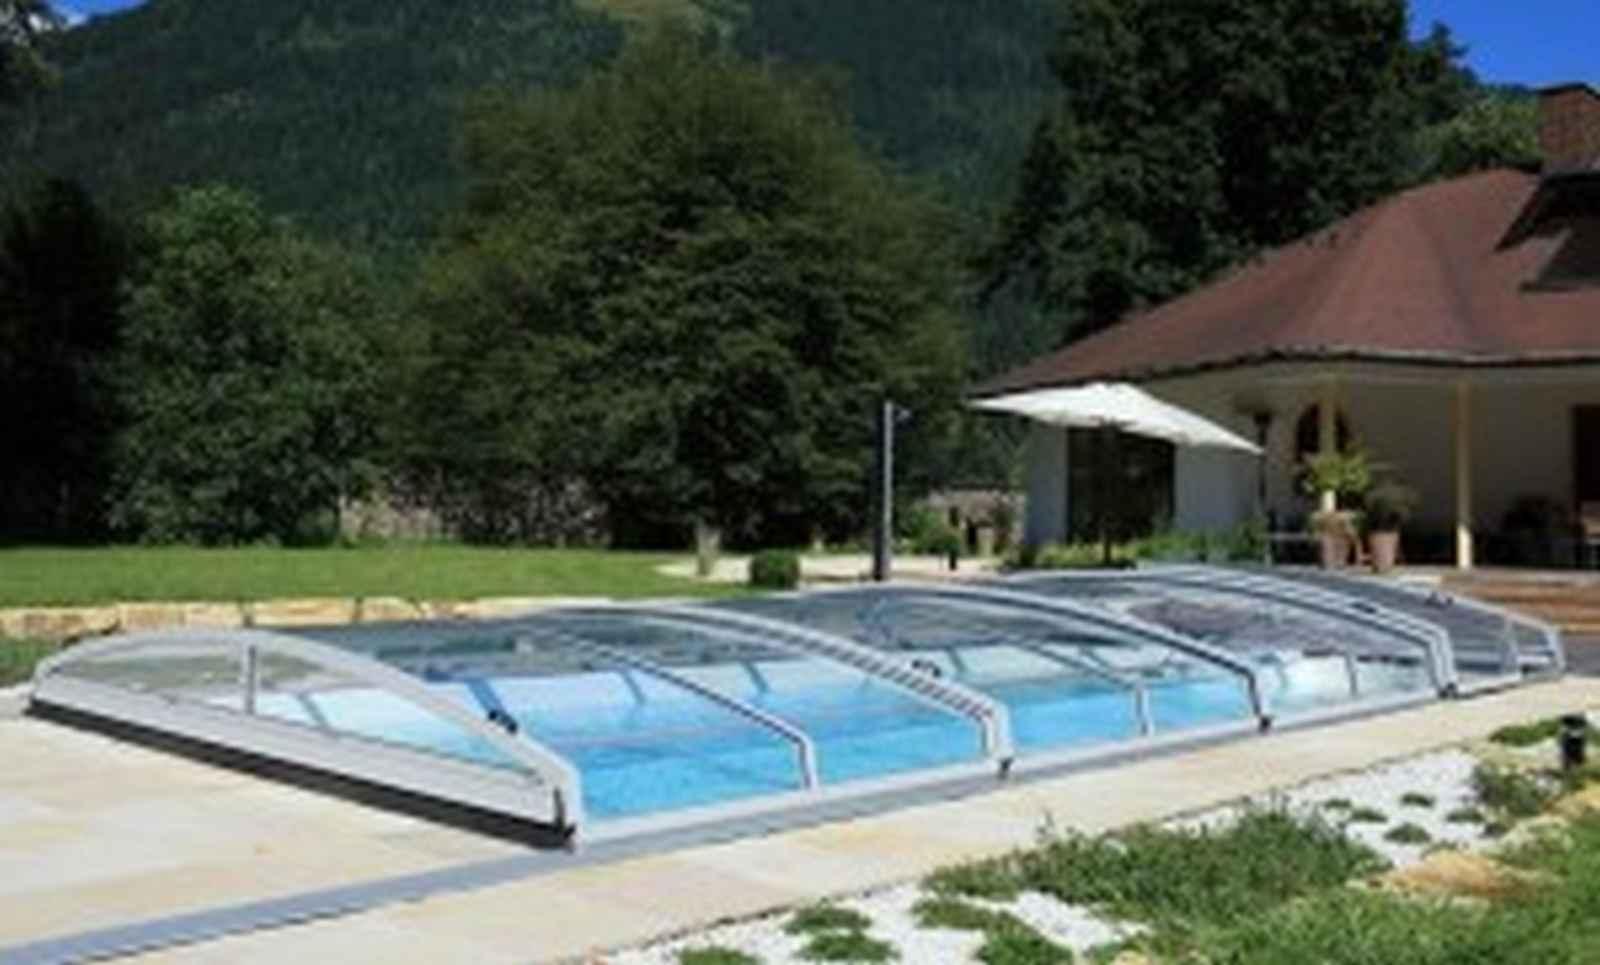 schwimmbadueberdachung__smaragd_20091228_1165054107